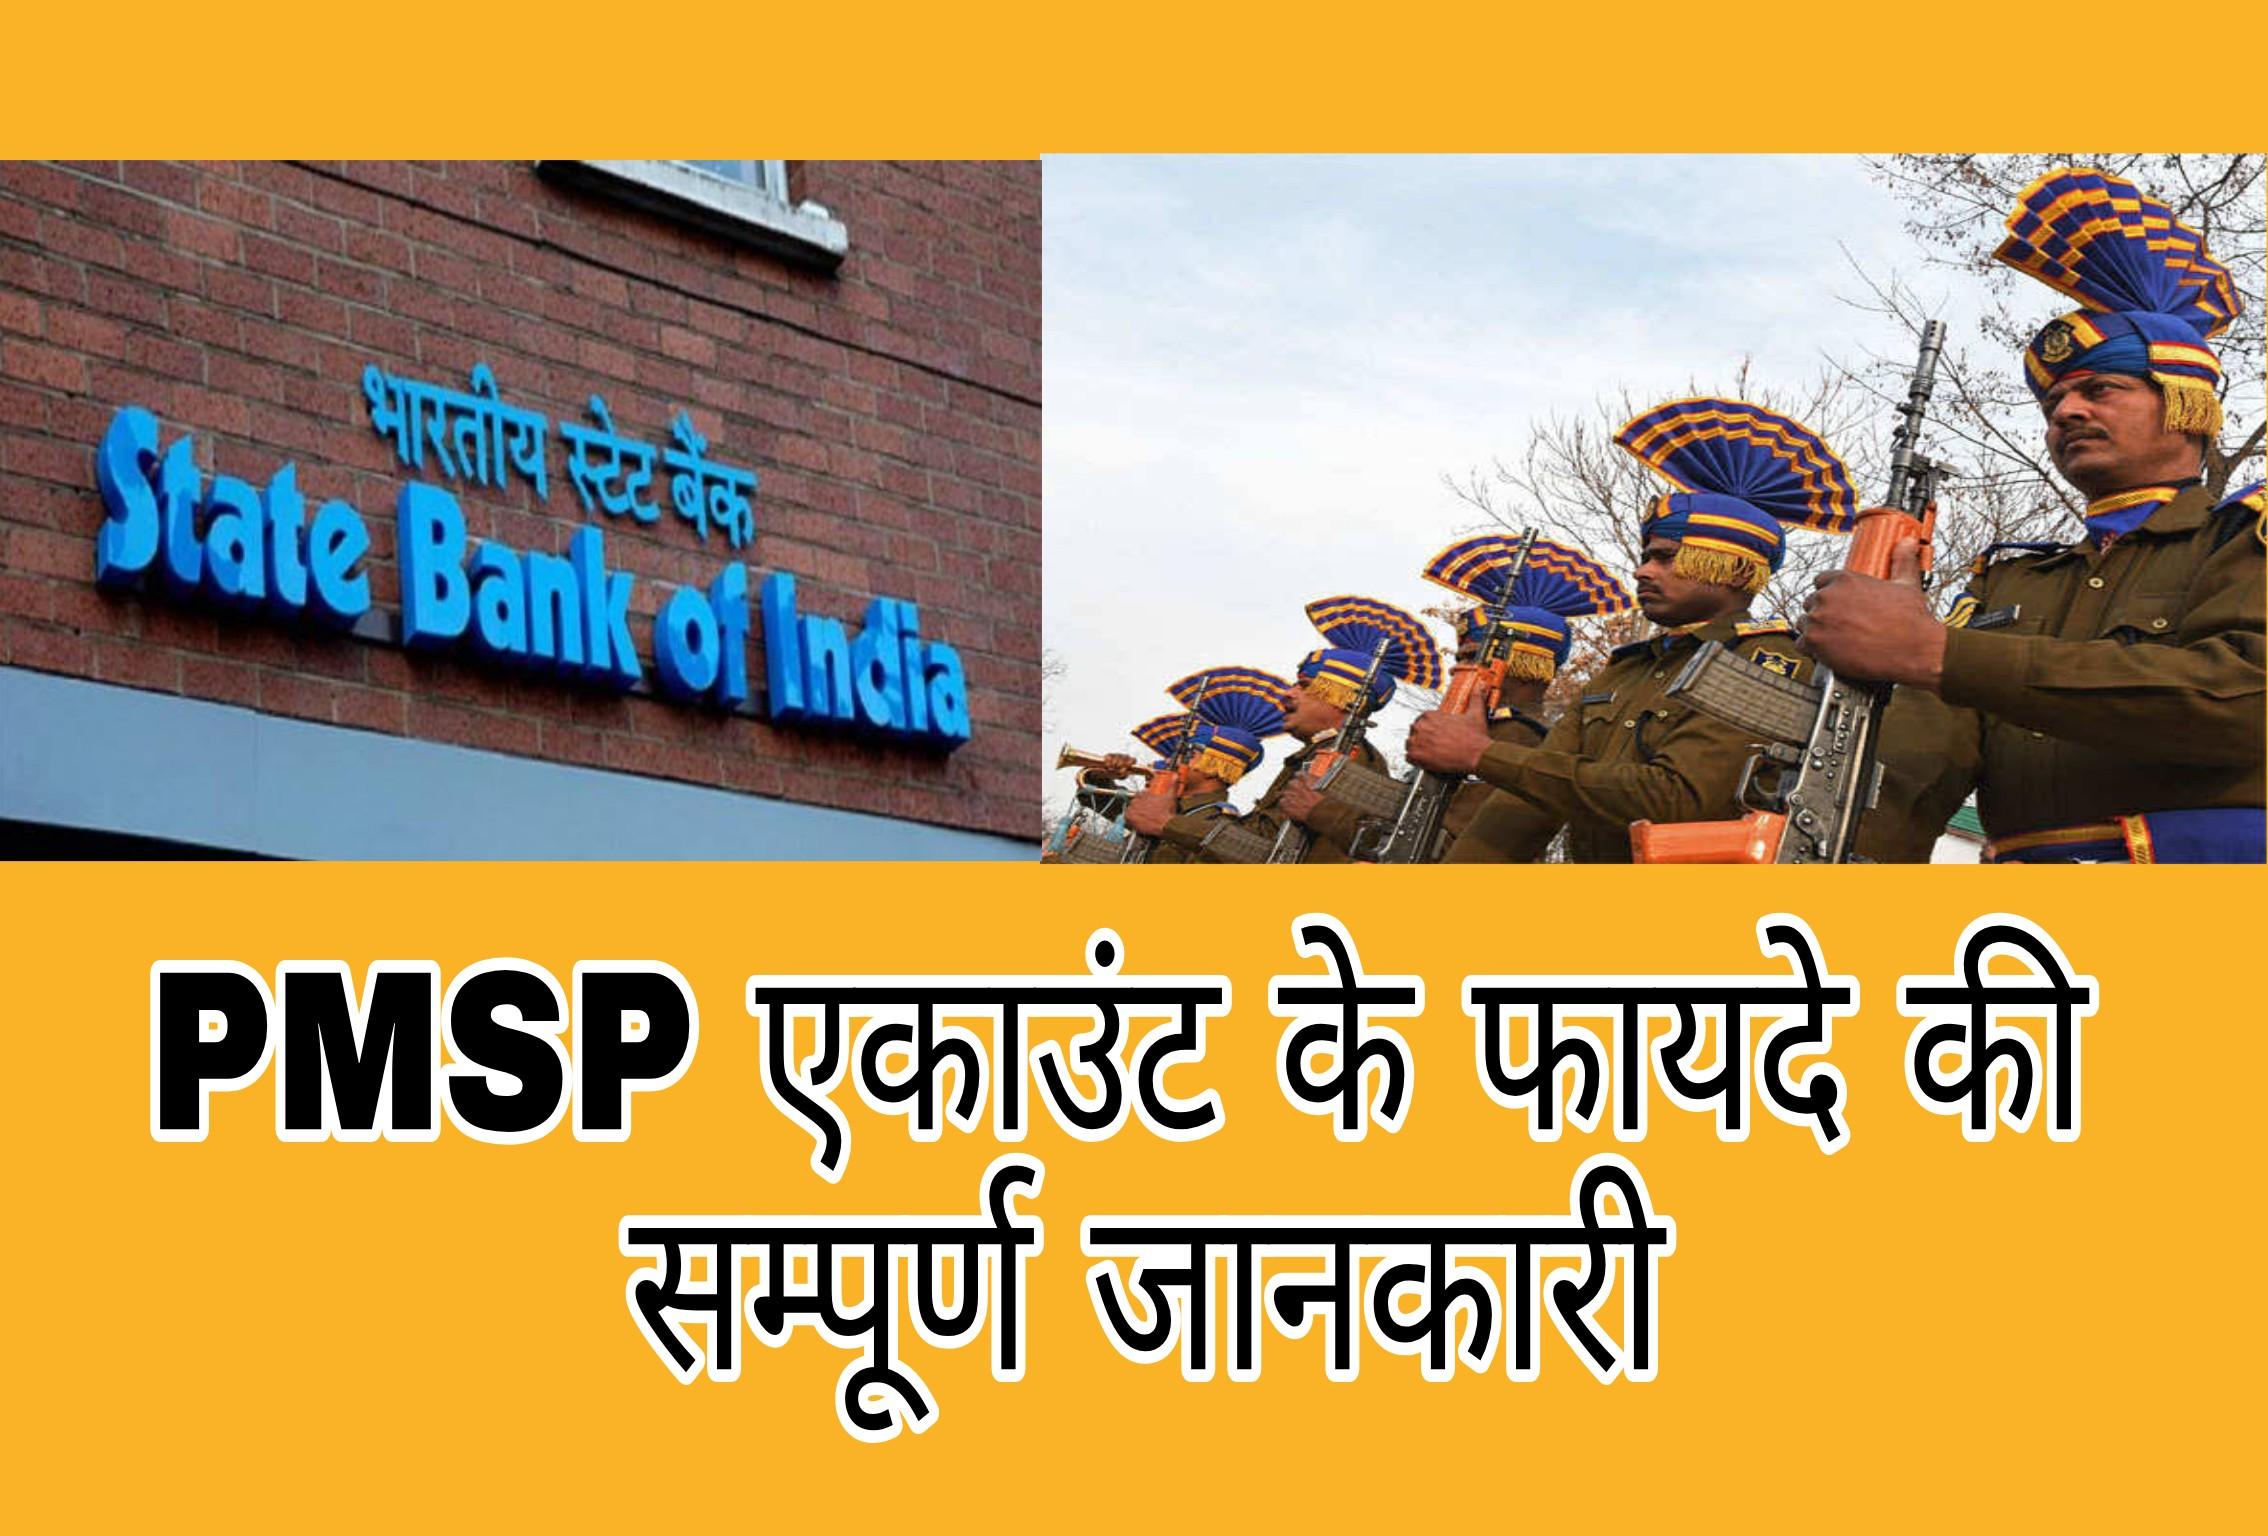 PMSP account benefits